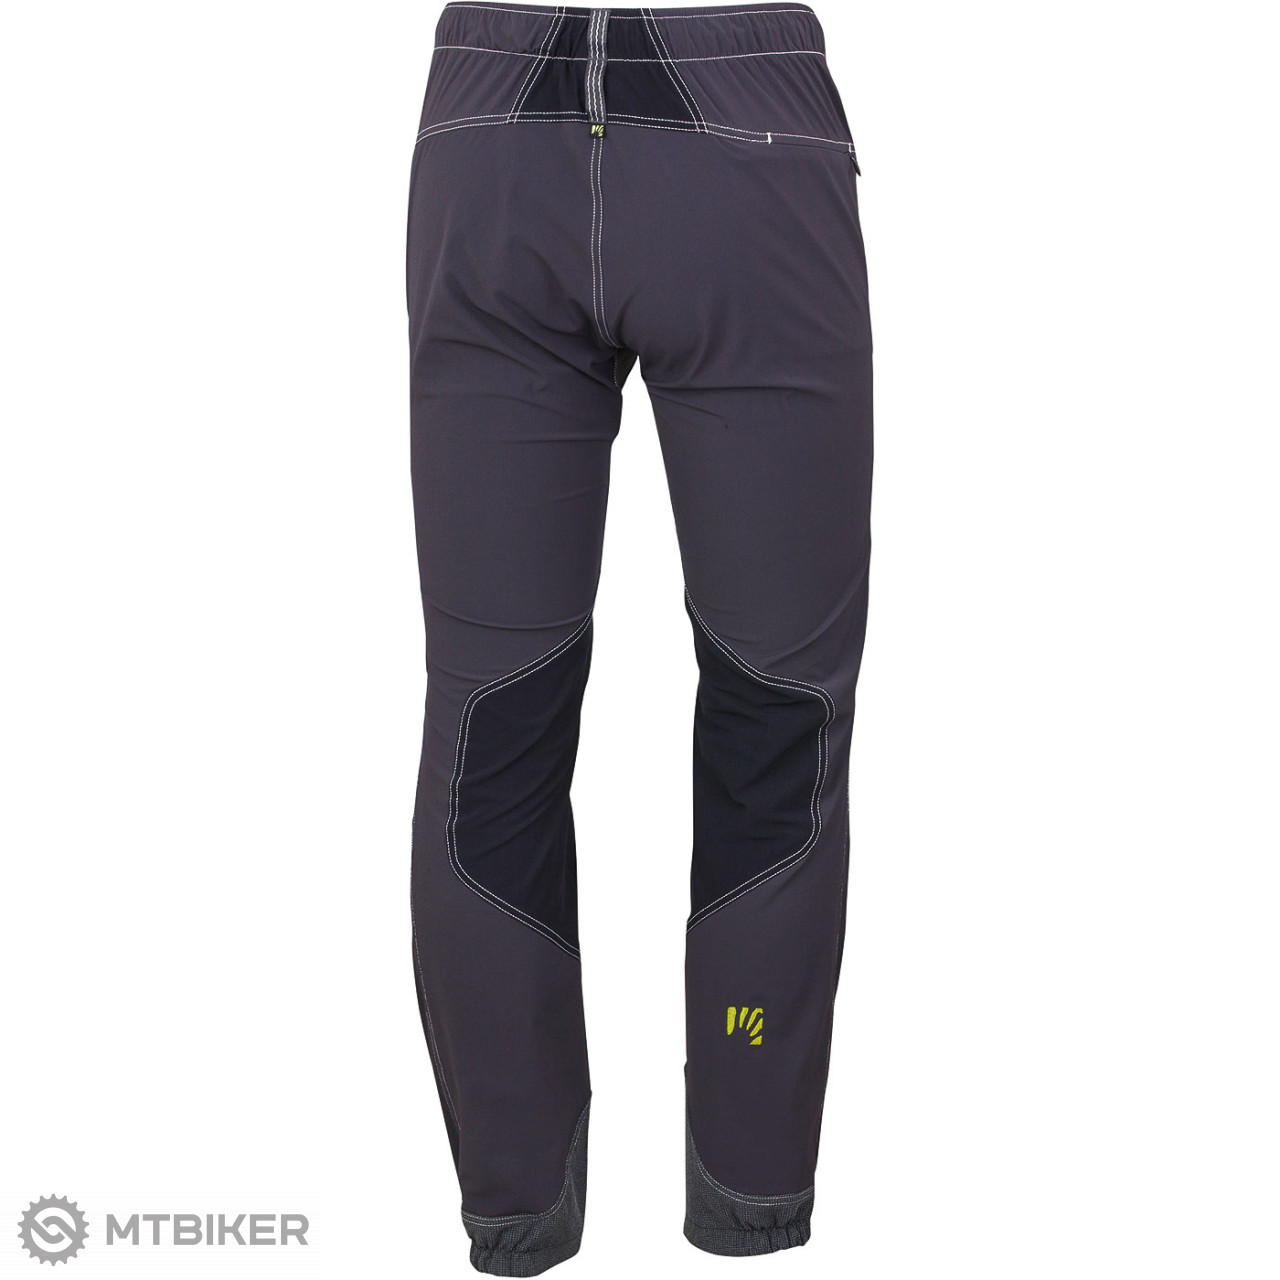 18f16da1ed41c Karpos ROCK S outdoorové nohavice čierne - MTBIKER Shop